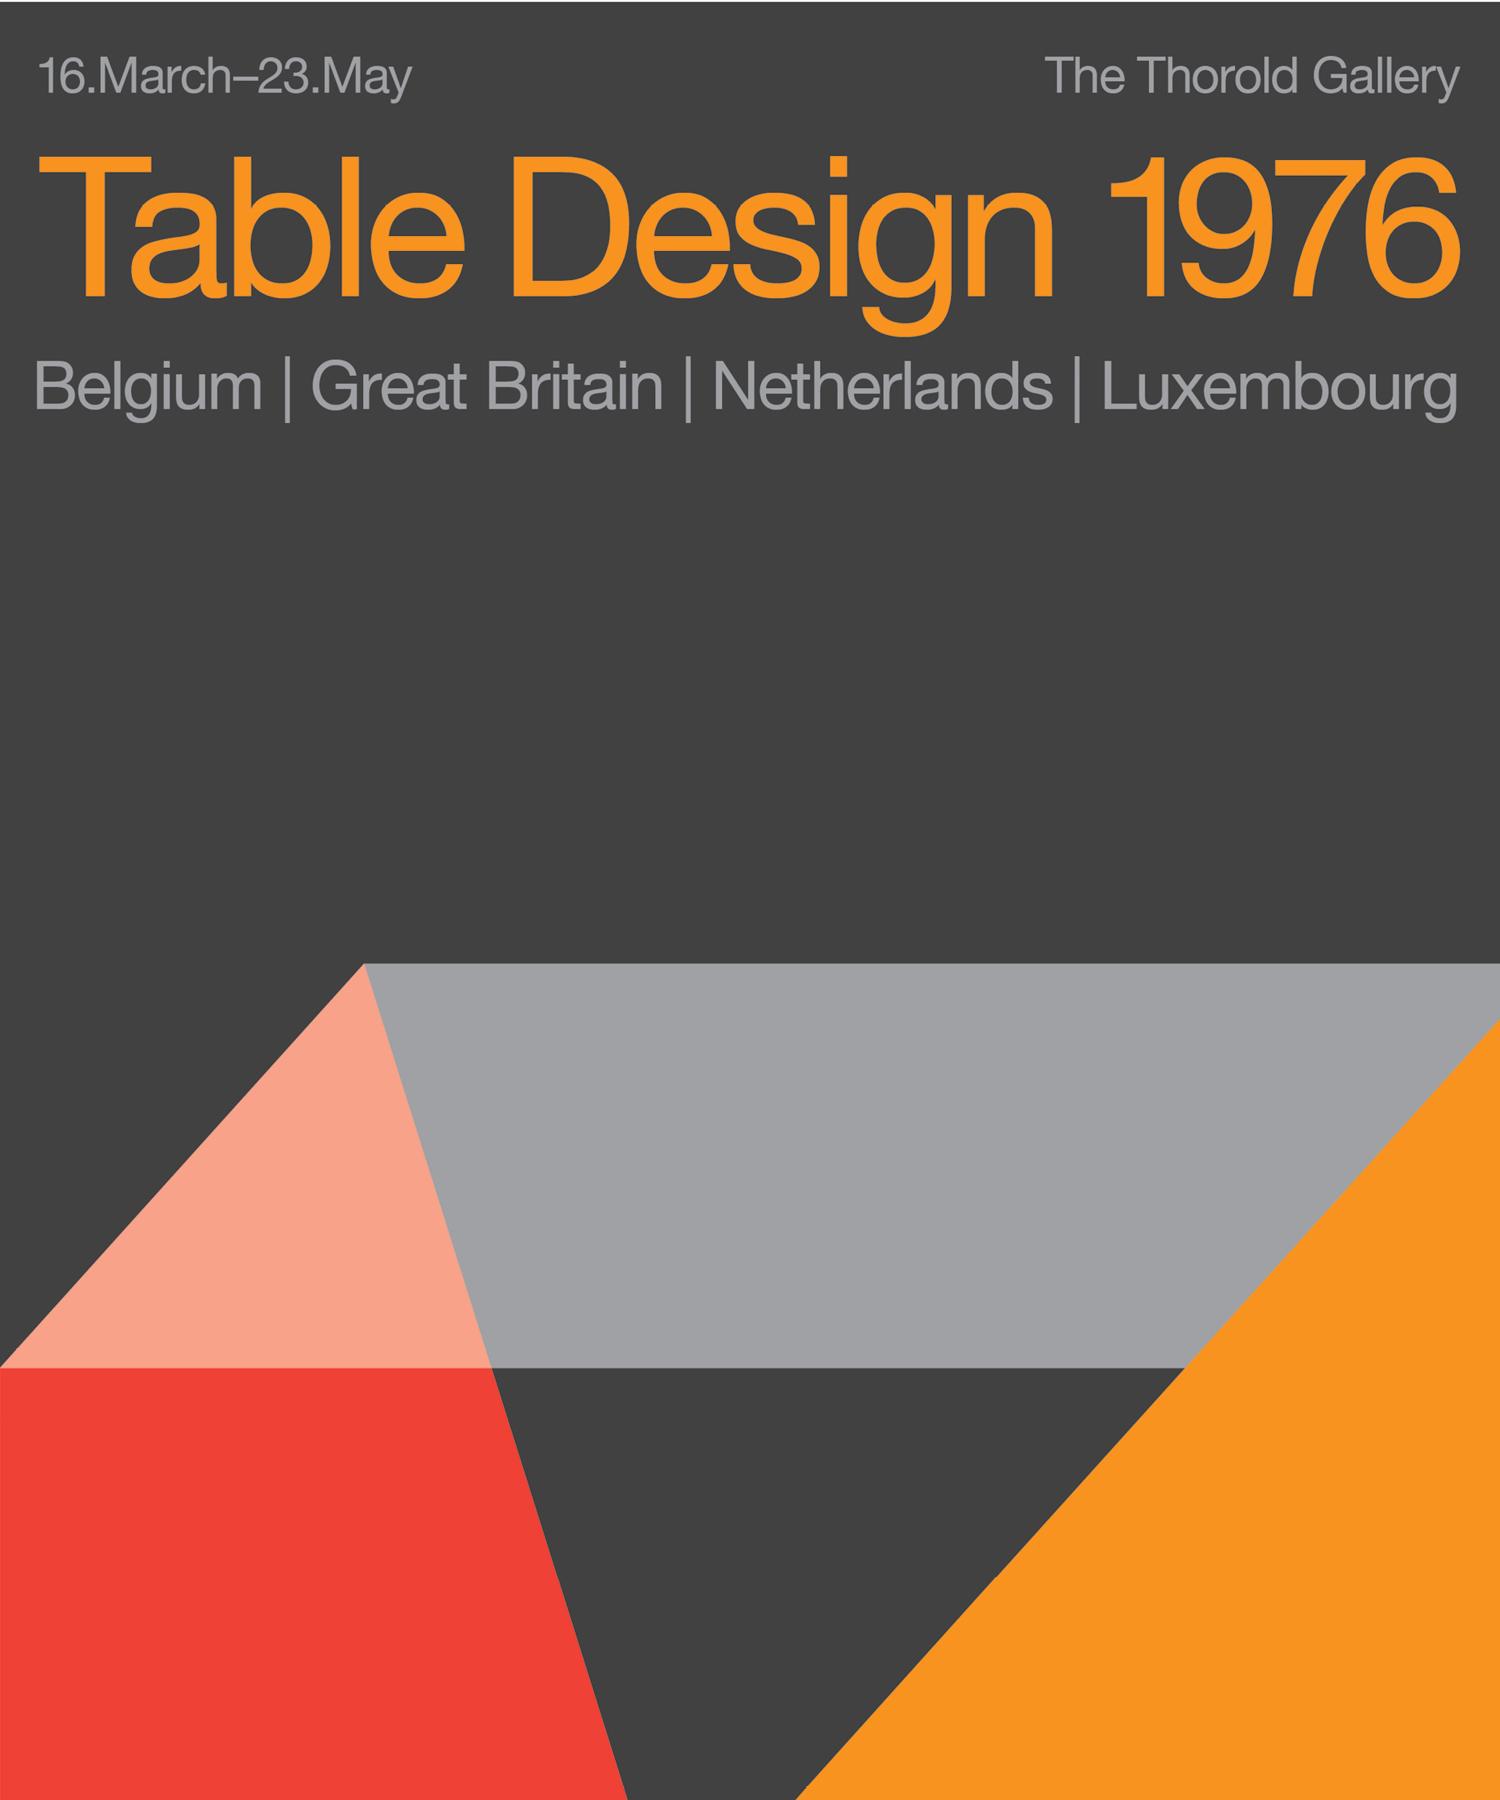 Montague-fictions-table3.jpg